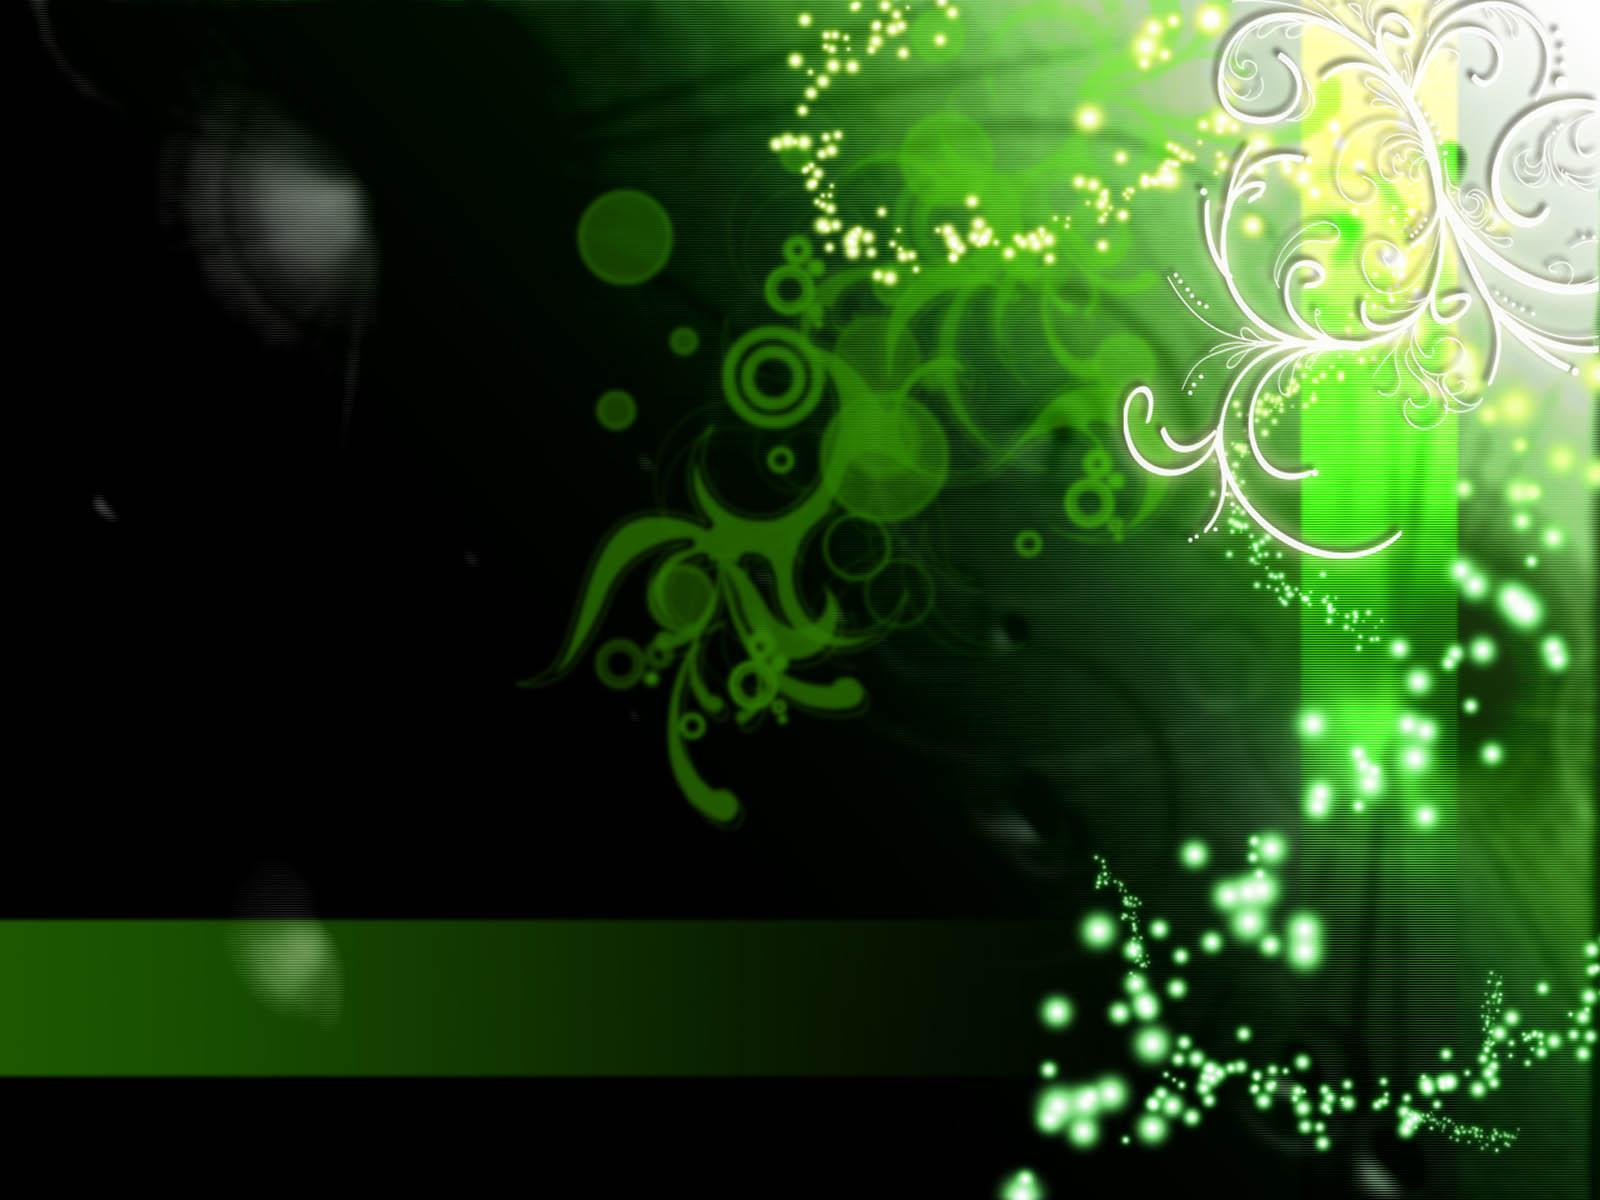 wallpapers: Green Abstract Wallpapers Abstract Green Desktop Wallpaper